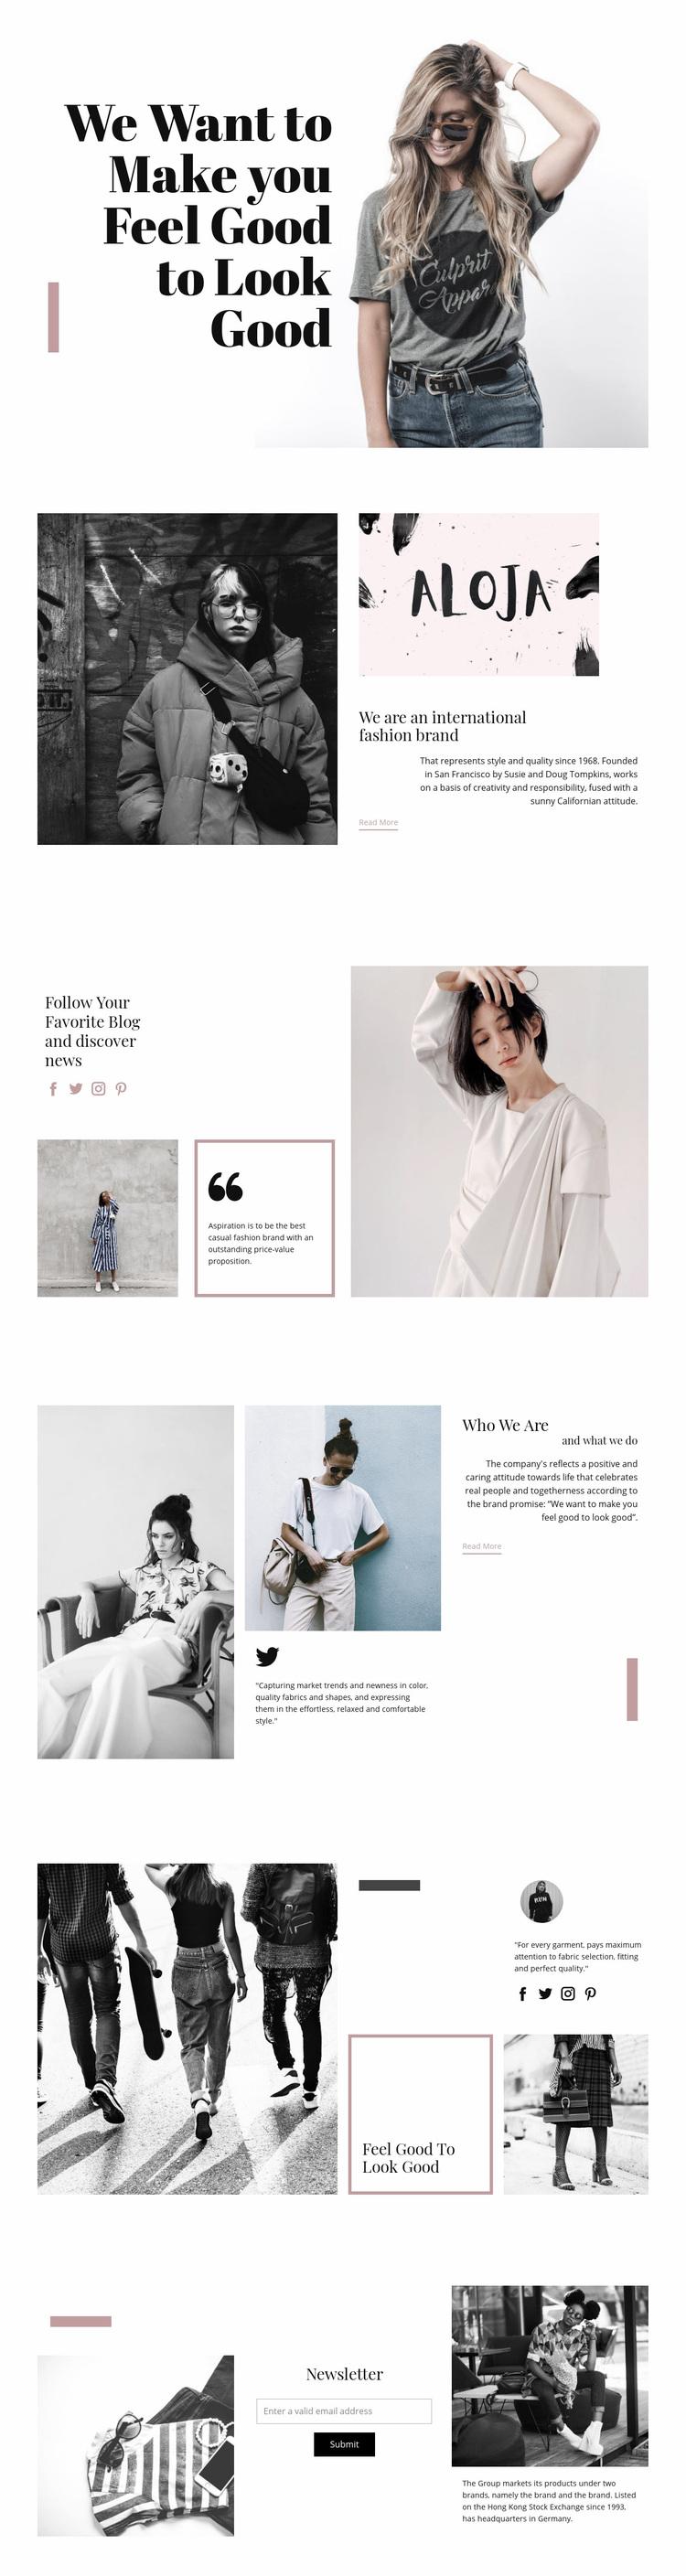 Fashion Style Web Page Designer